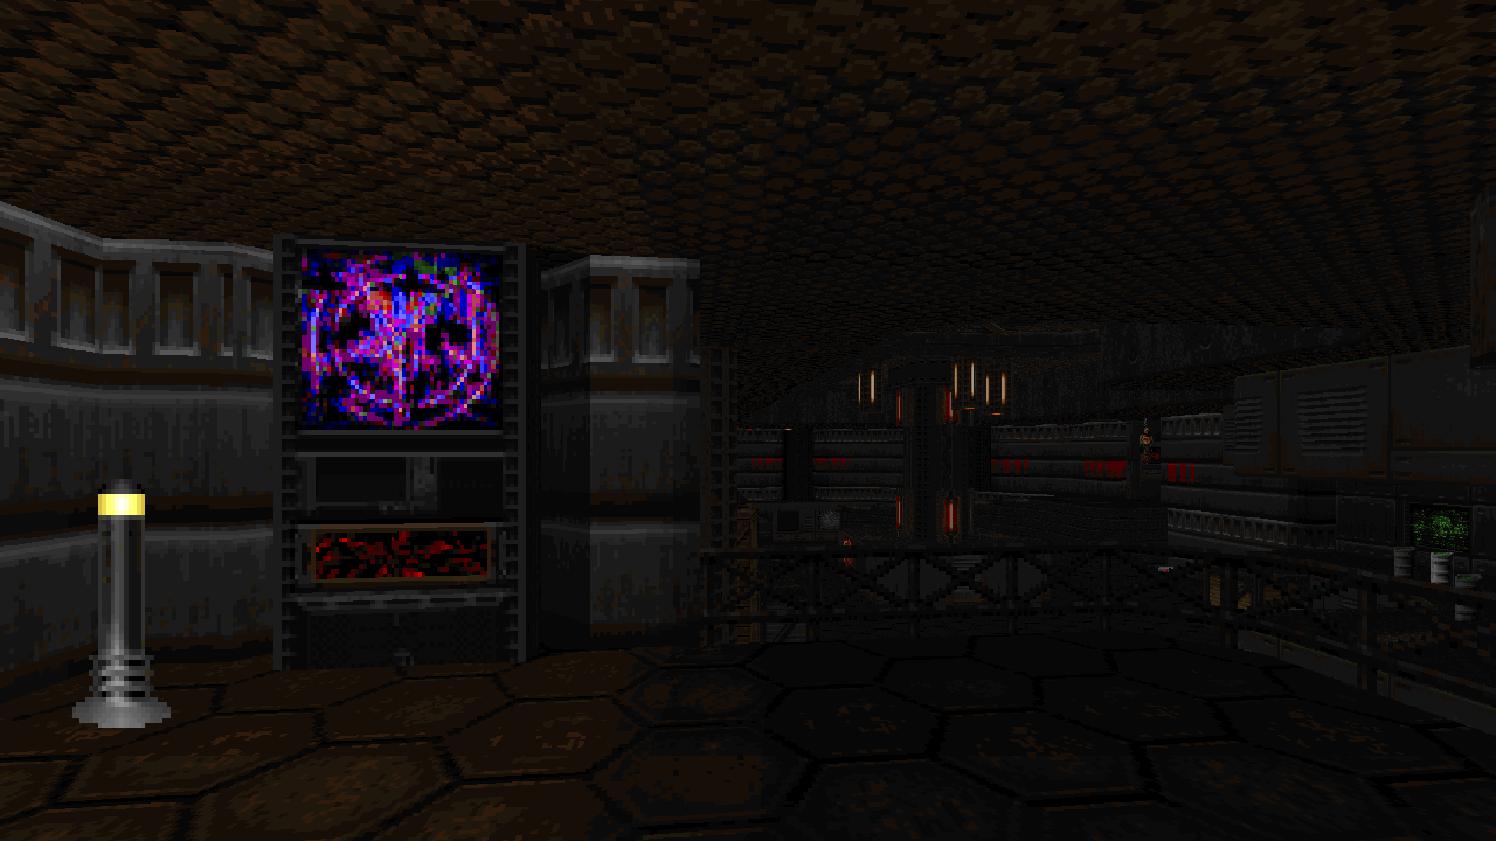 Screenshot_Doom_20200107_153838.png.ae8cbcf4975fc98253e3a51d49bfdcad.png